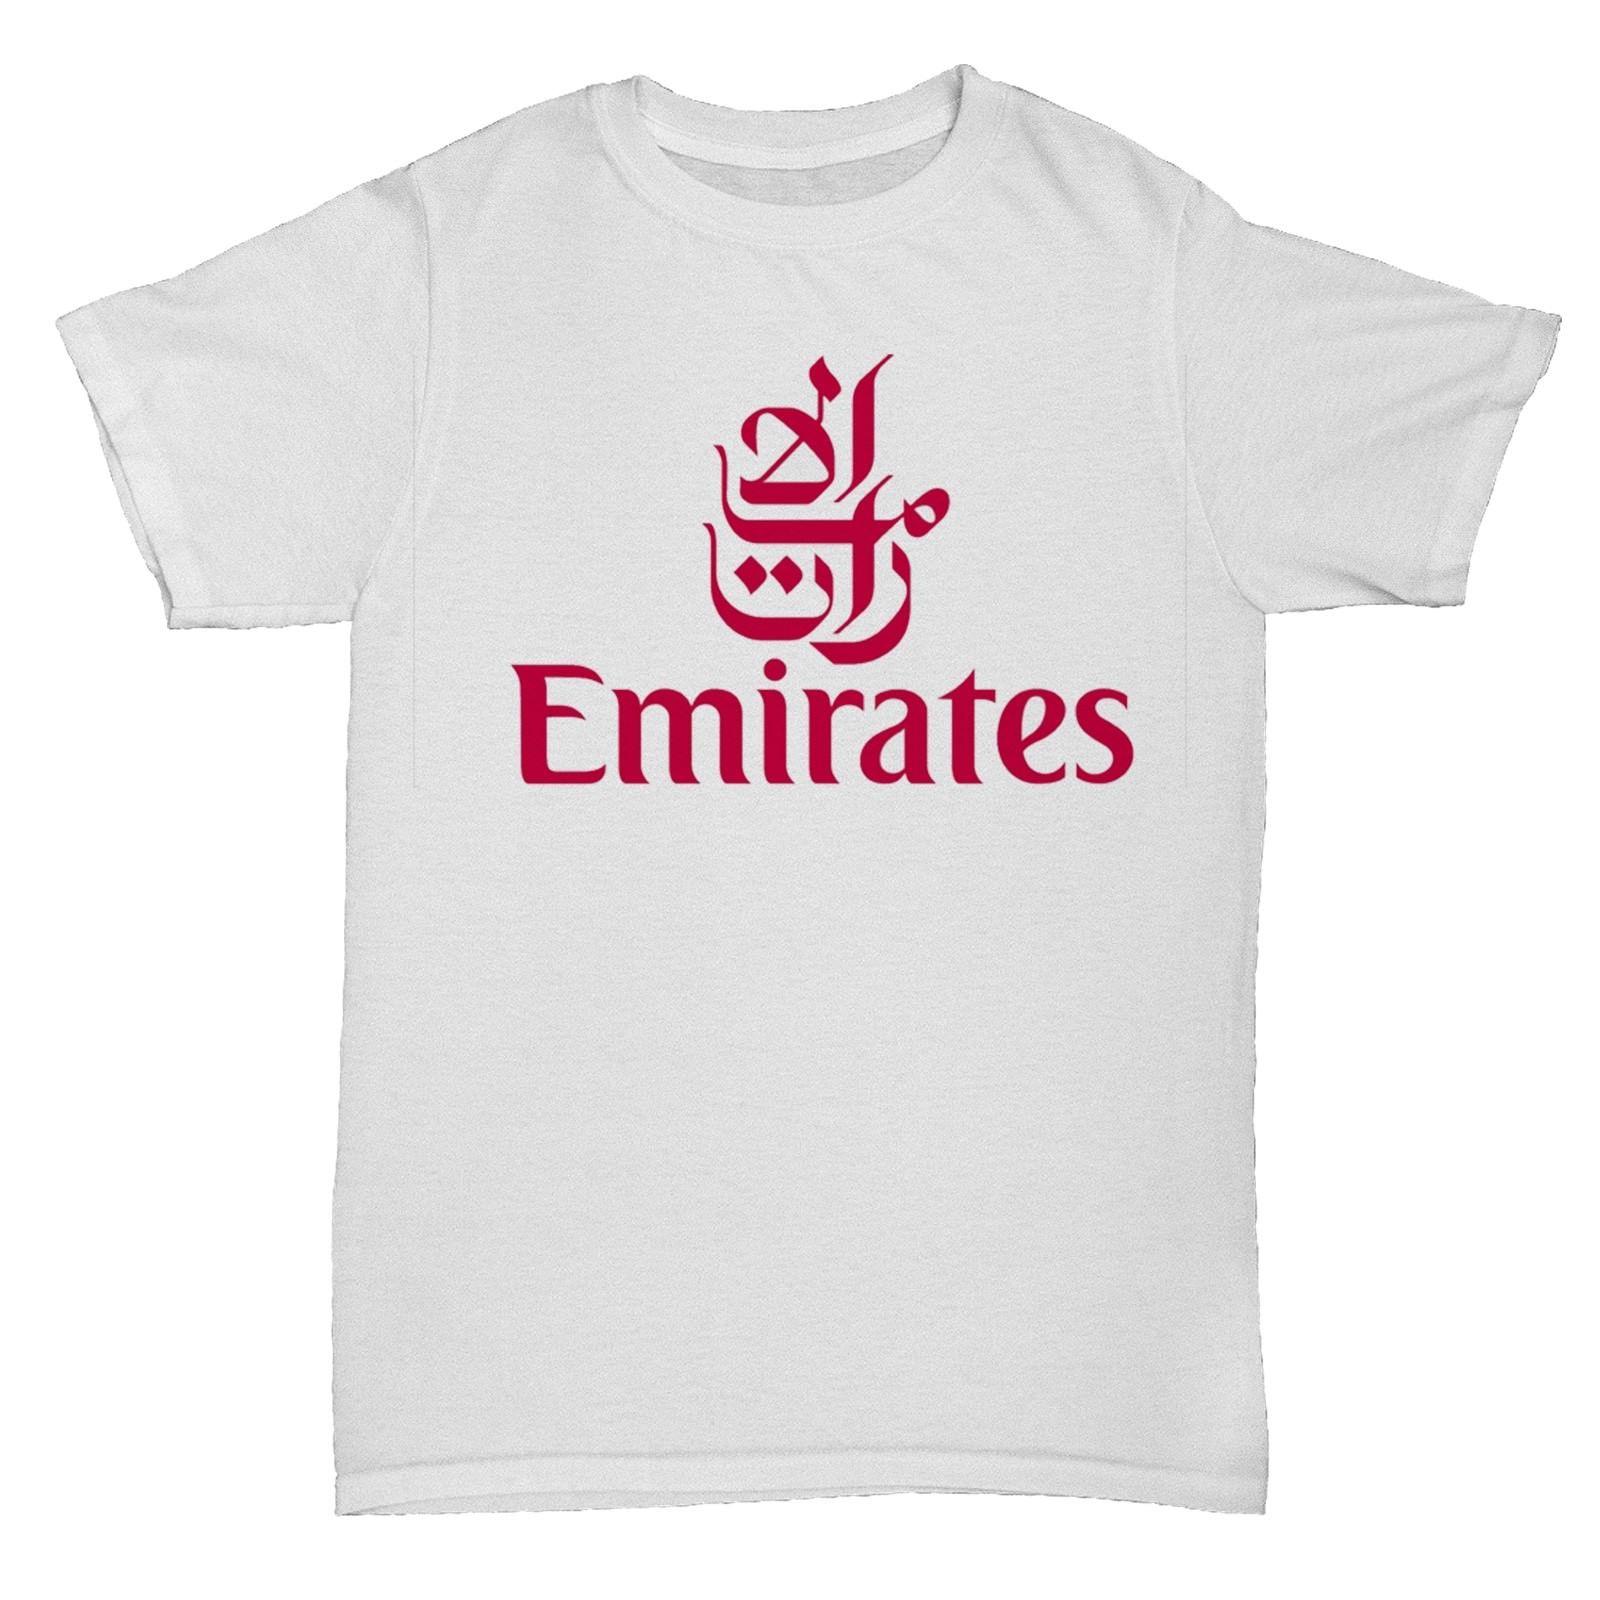 EMIRATES UAE AIRWAYS BA AIRLINES RETRO AEROPLANE BOAC PAN AM T SHIRT Men T-Shirts Men Clothing Plus Size top tee